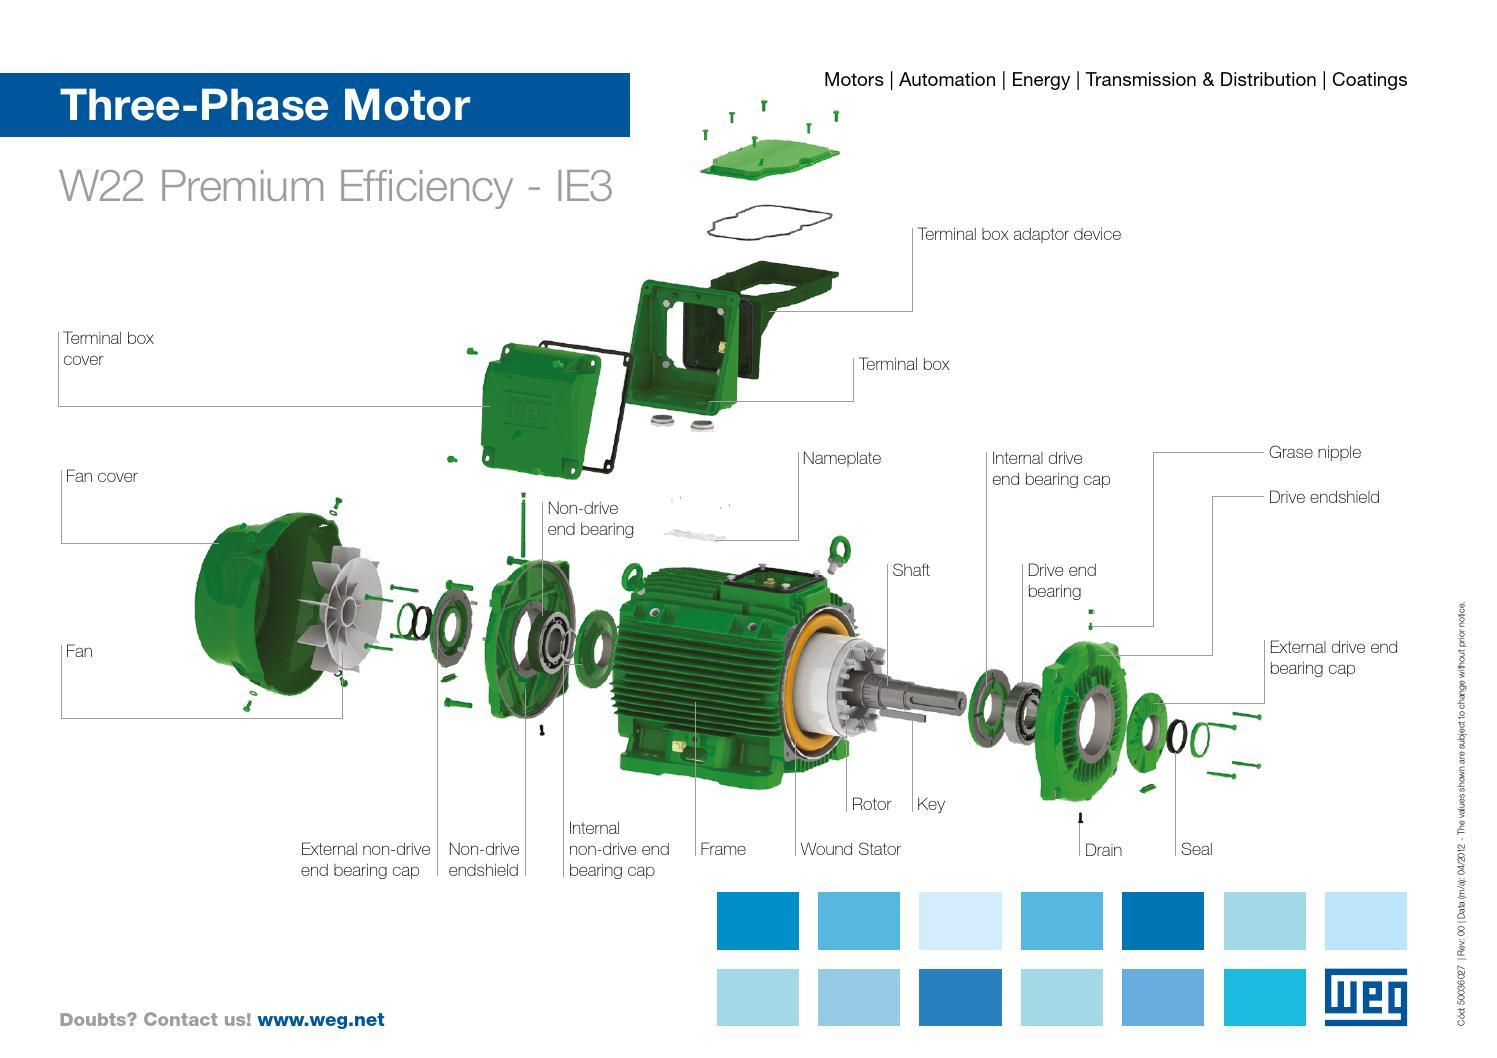 Weg w22 three phase motor exploded view eriks by eriks for Weg motors technical support